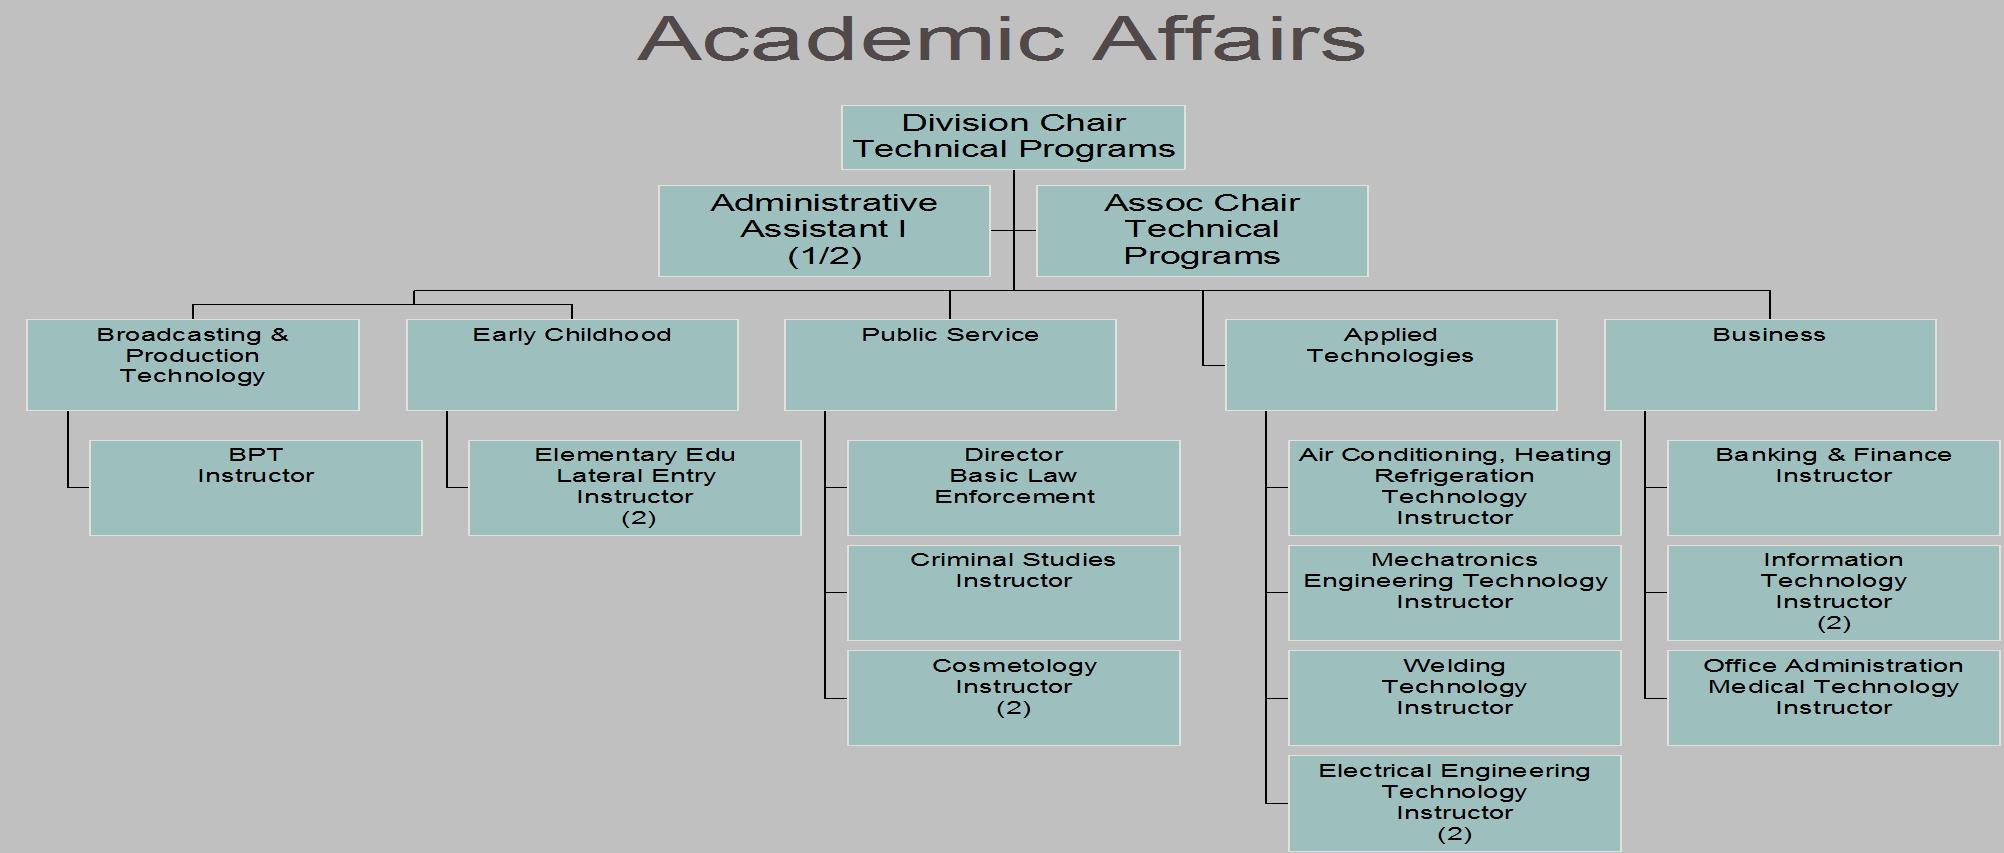 Academic Affairs 4